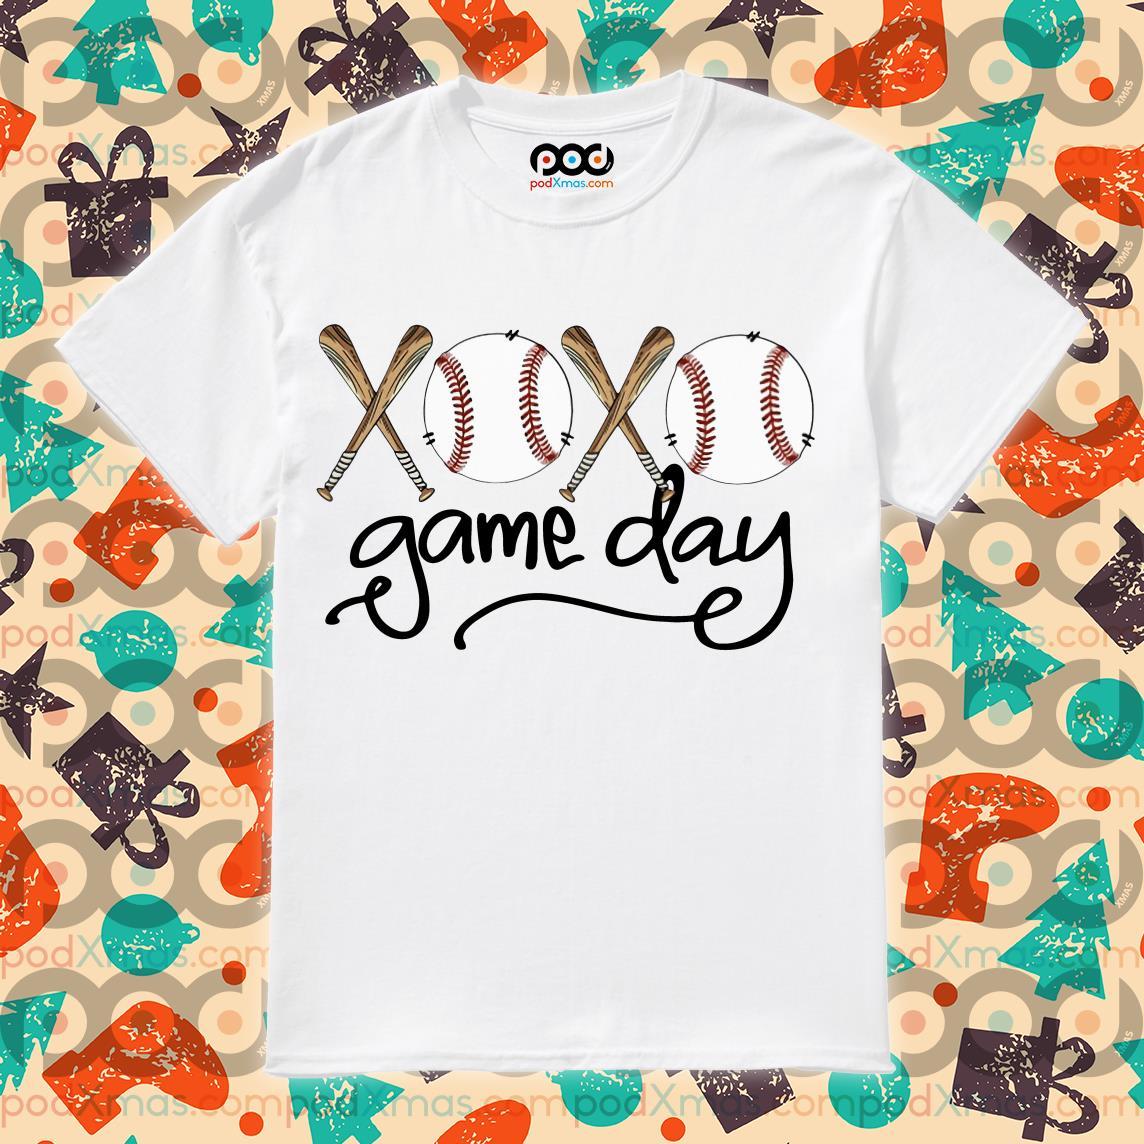 Baseball xoxo game day shirt